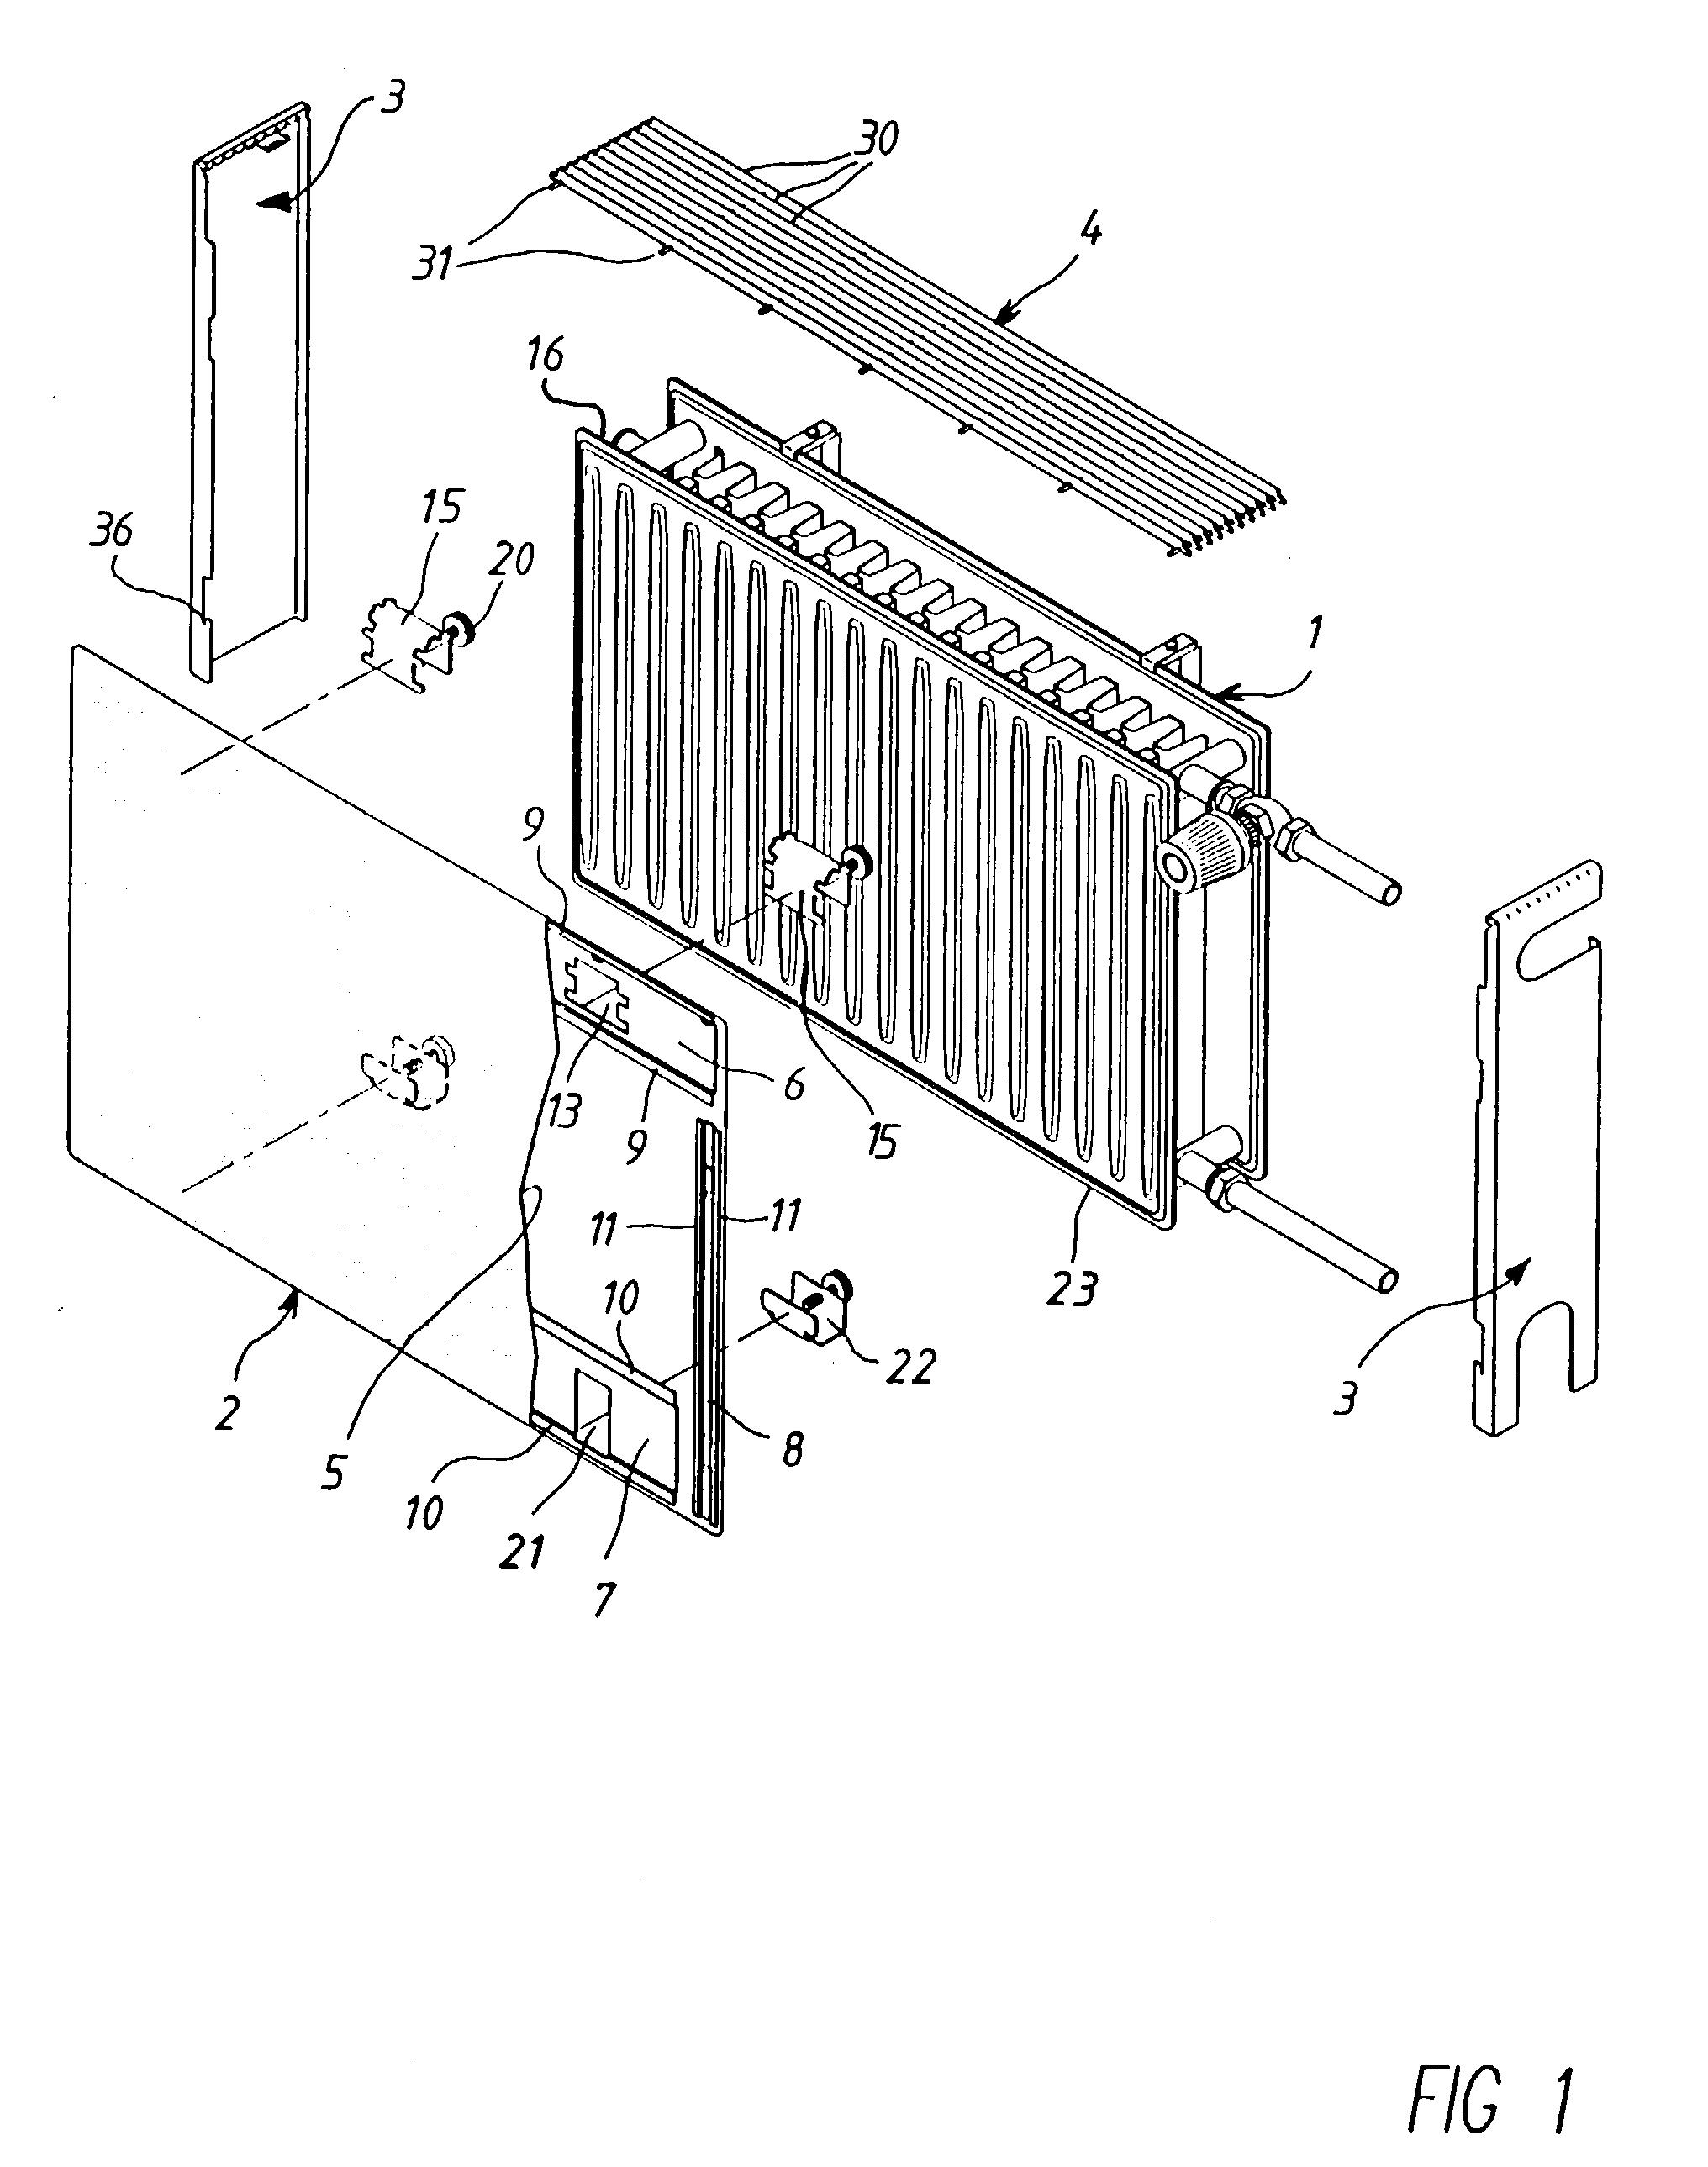 patent ep0787955b1 verkleidung f r einen plattenheizk rper google patents. Black Bedroom Furniture Sets. Home Design Ideas